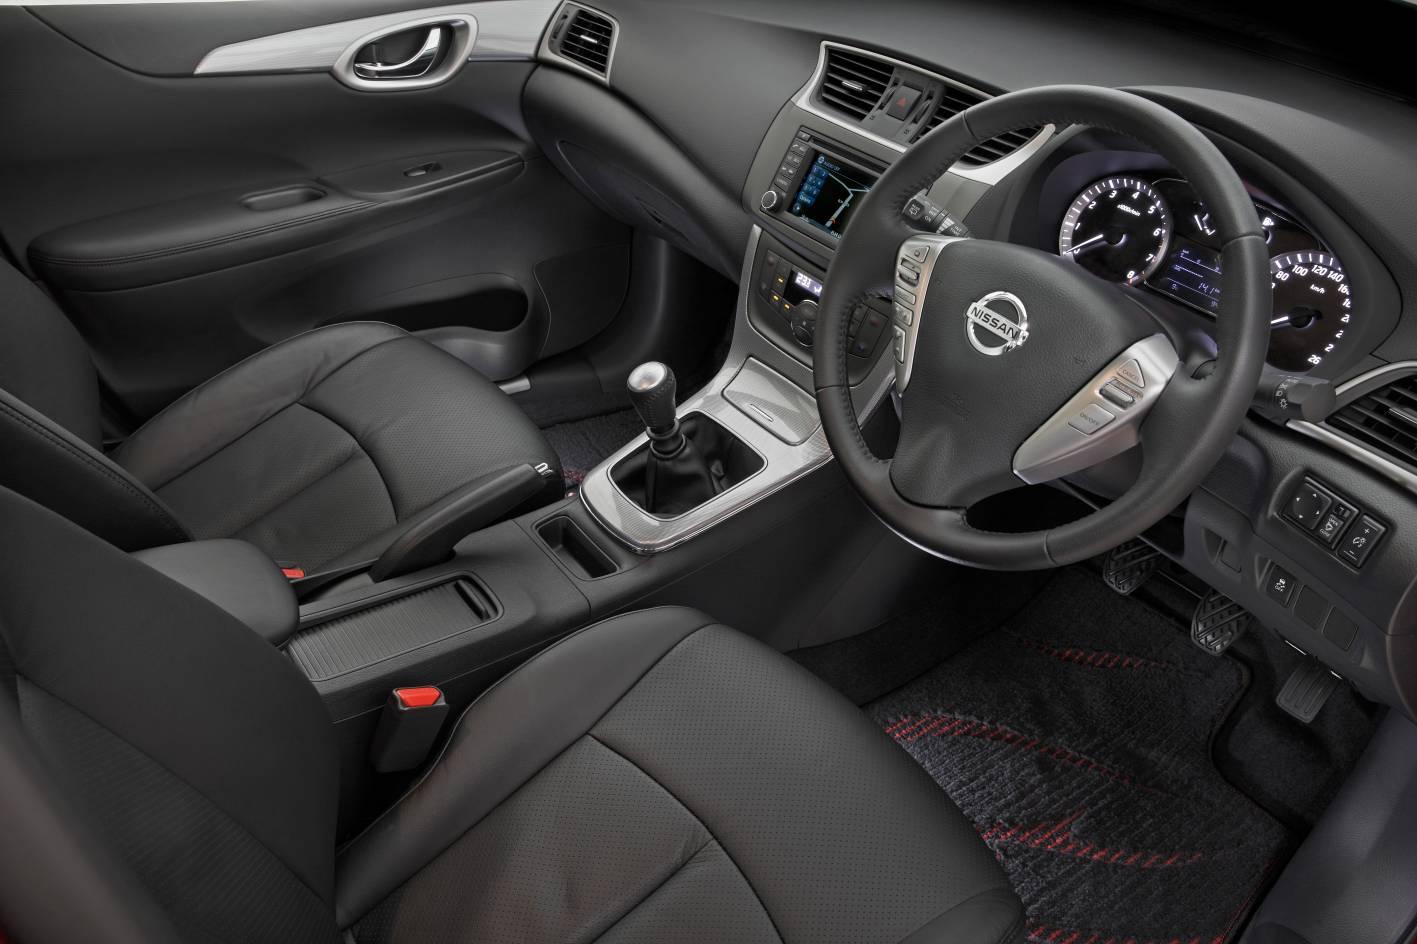 2013 Nissan Pulsar Sss Hatch Interior